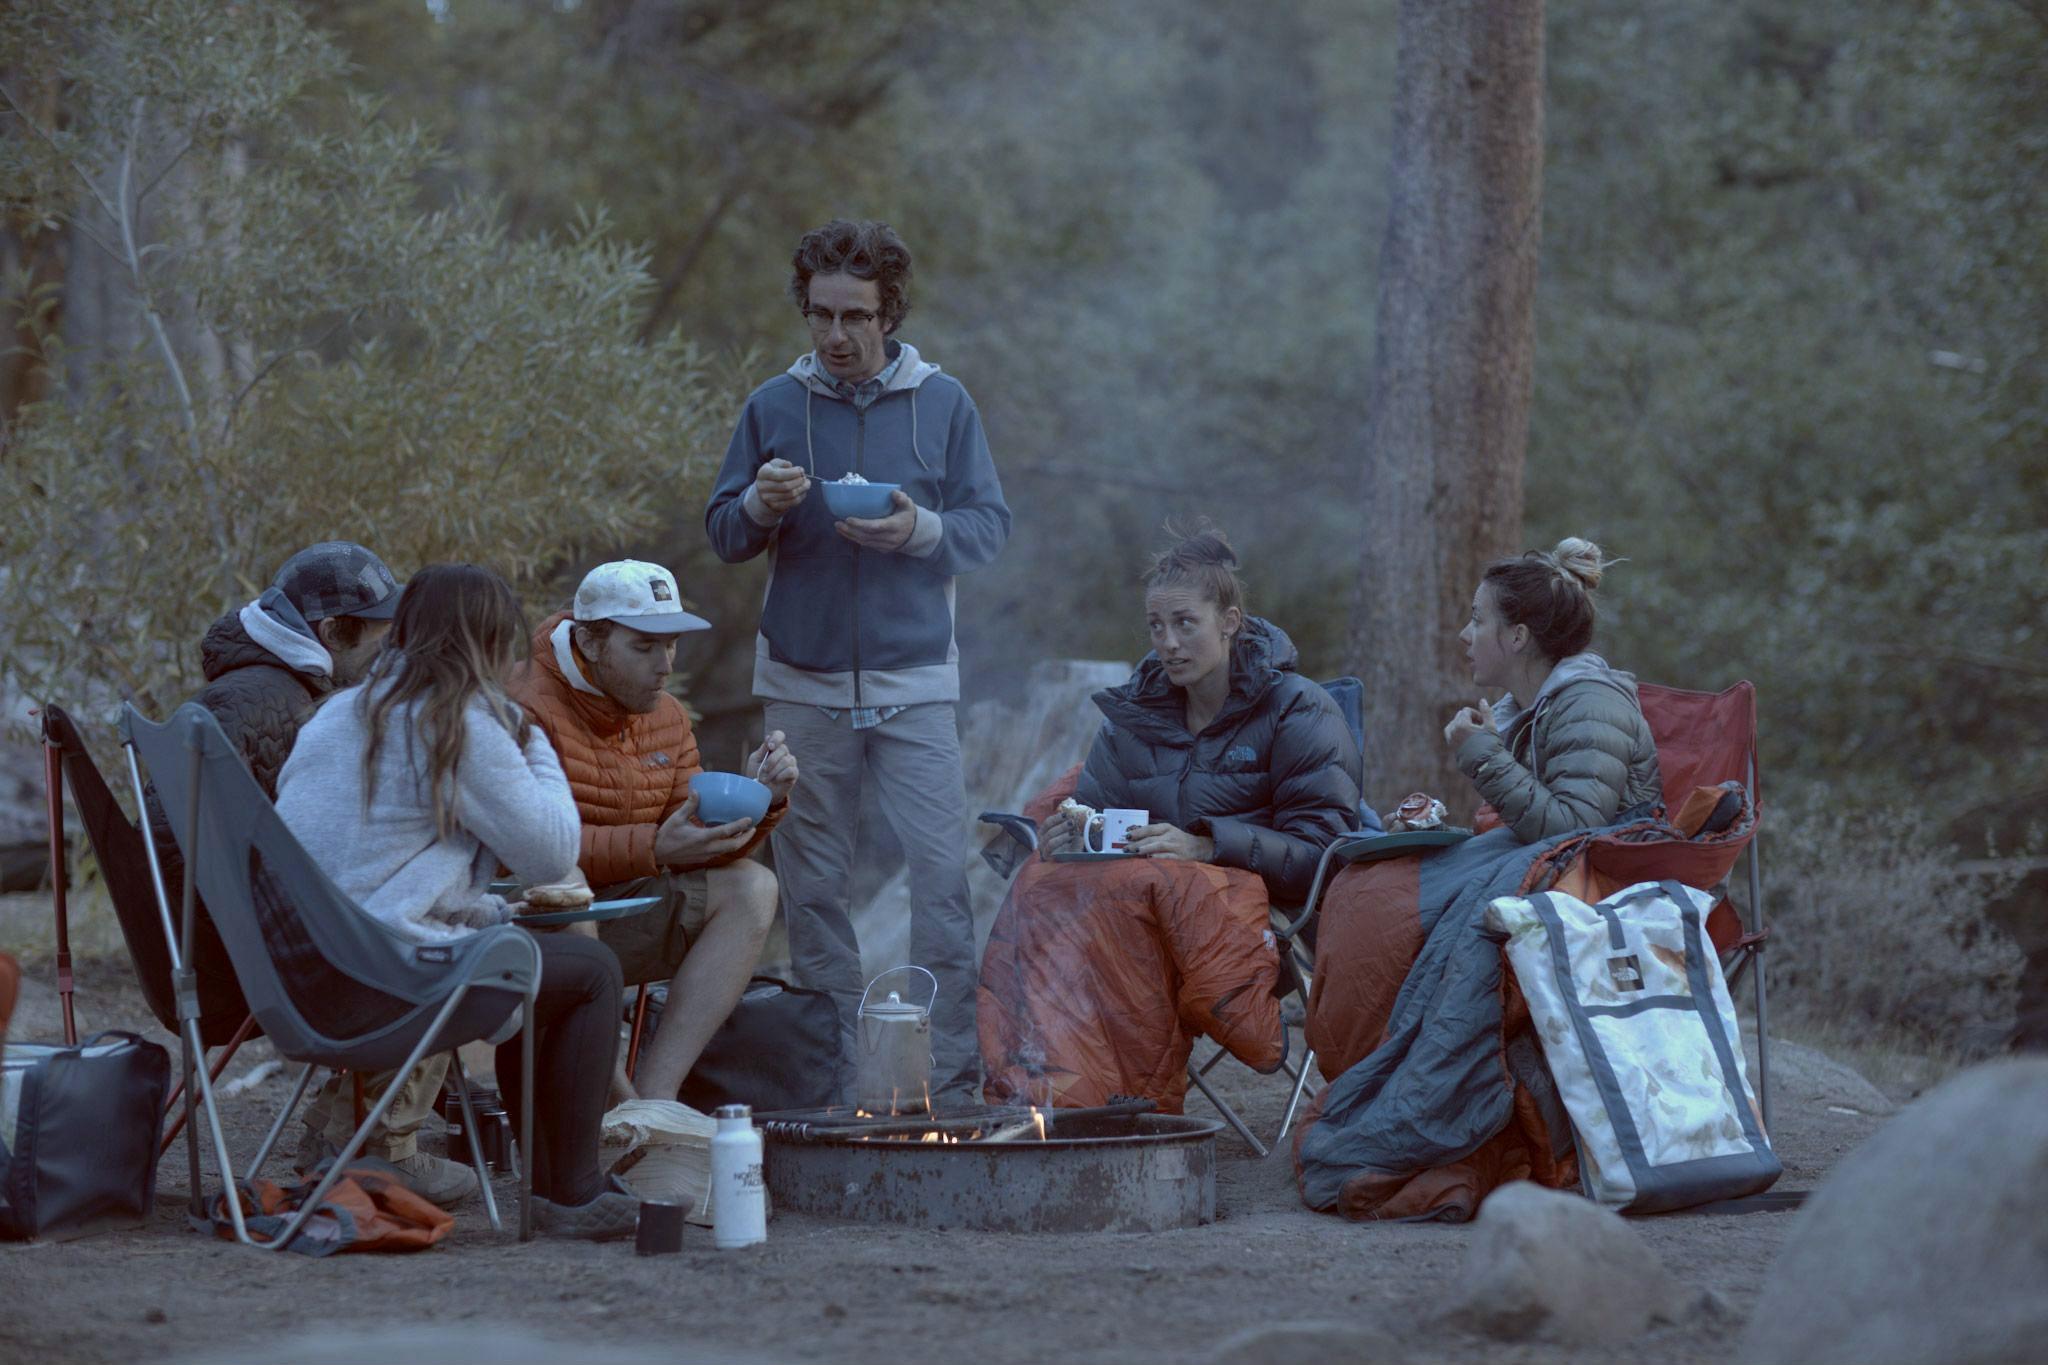 camping_comida_2